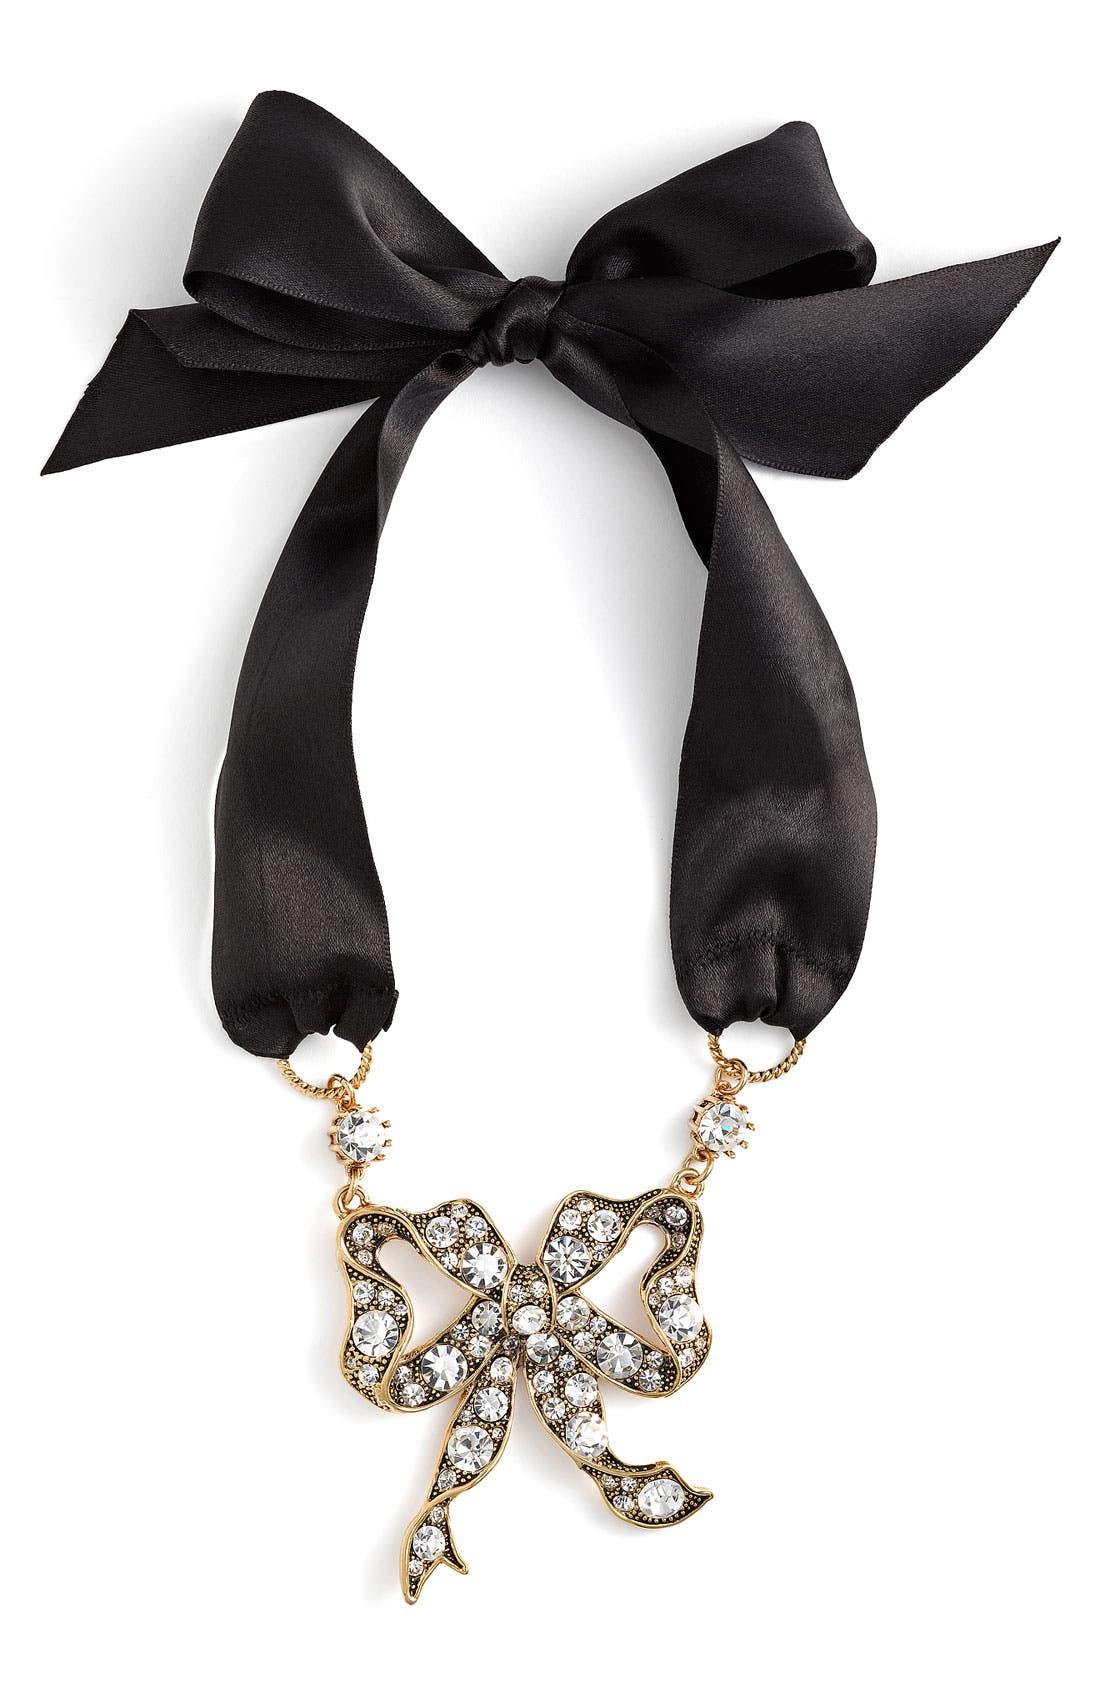 Main Image - Betsey Johnson 'Iconic' Bow & Satin Tie Necklace